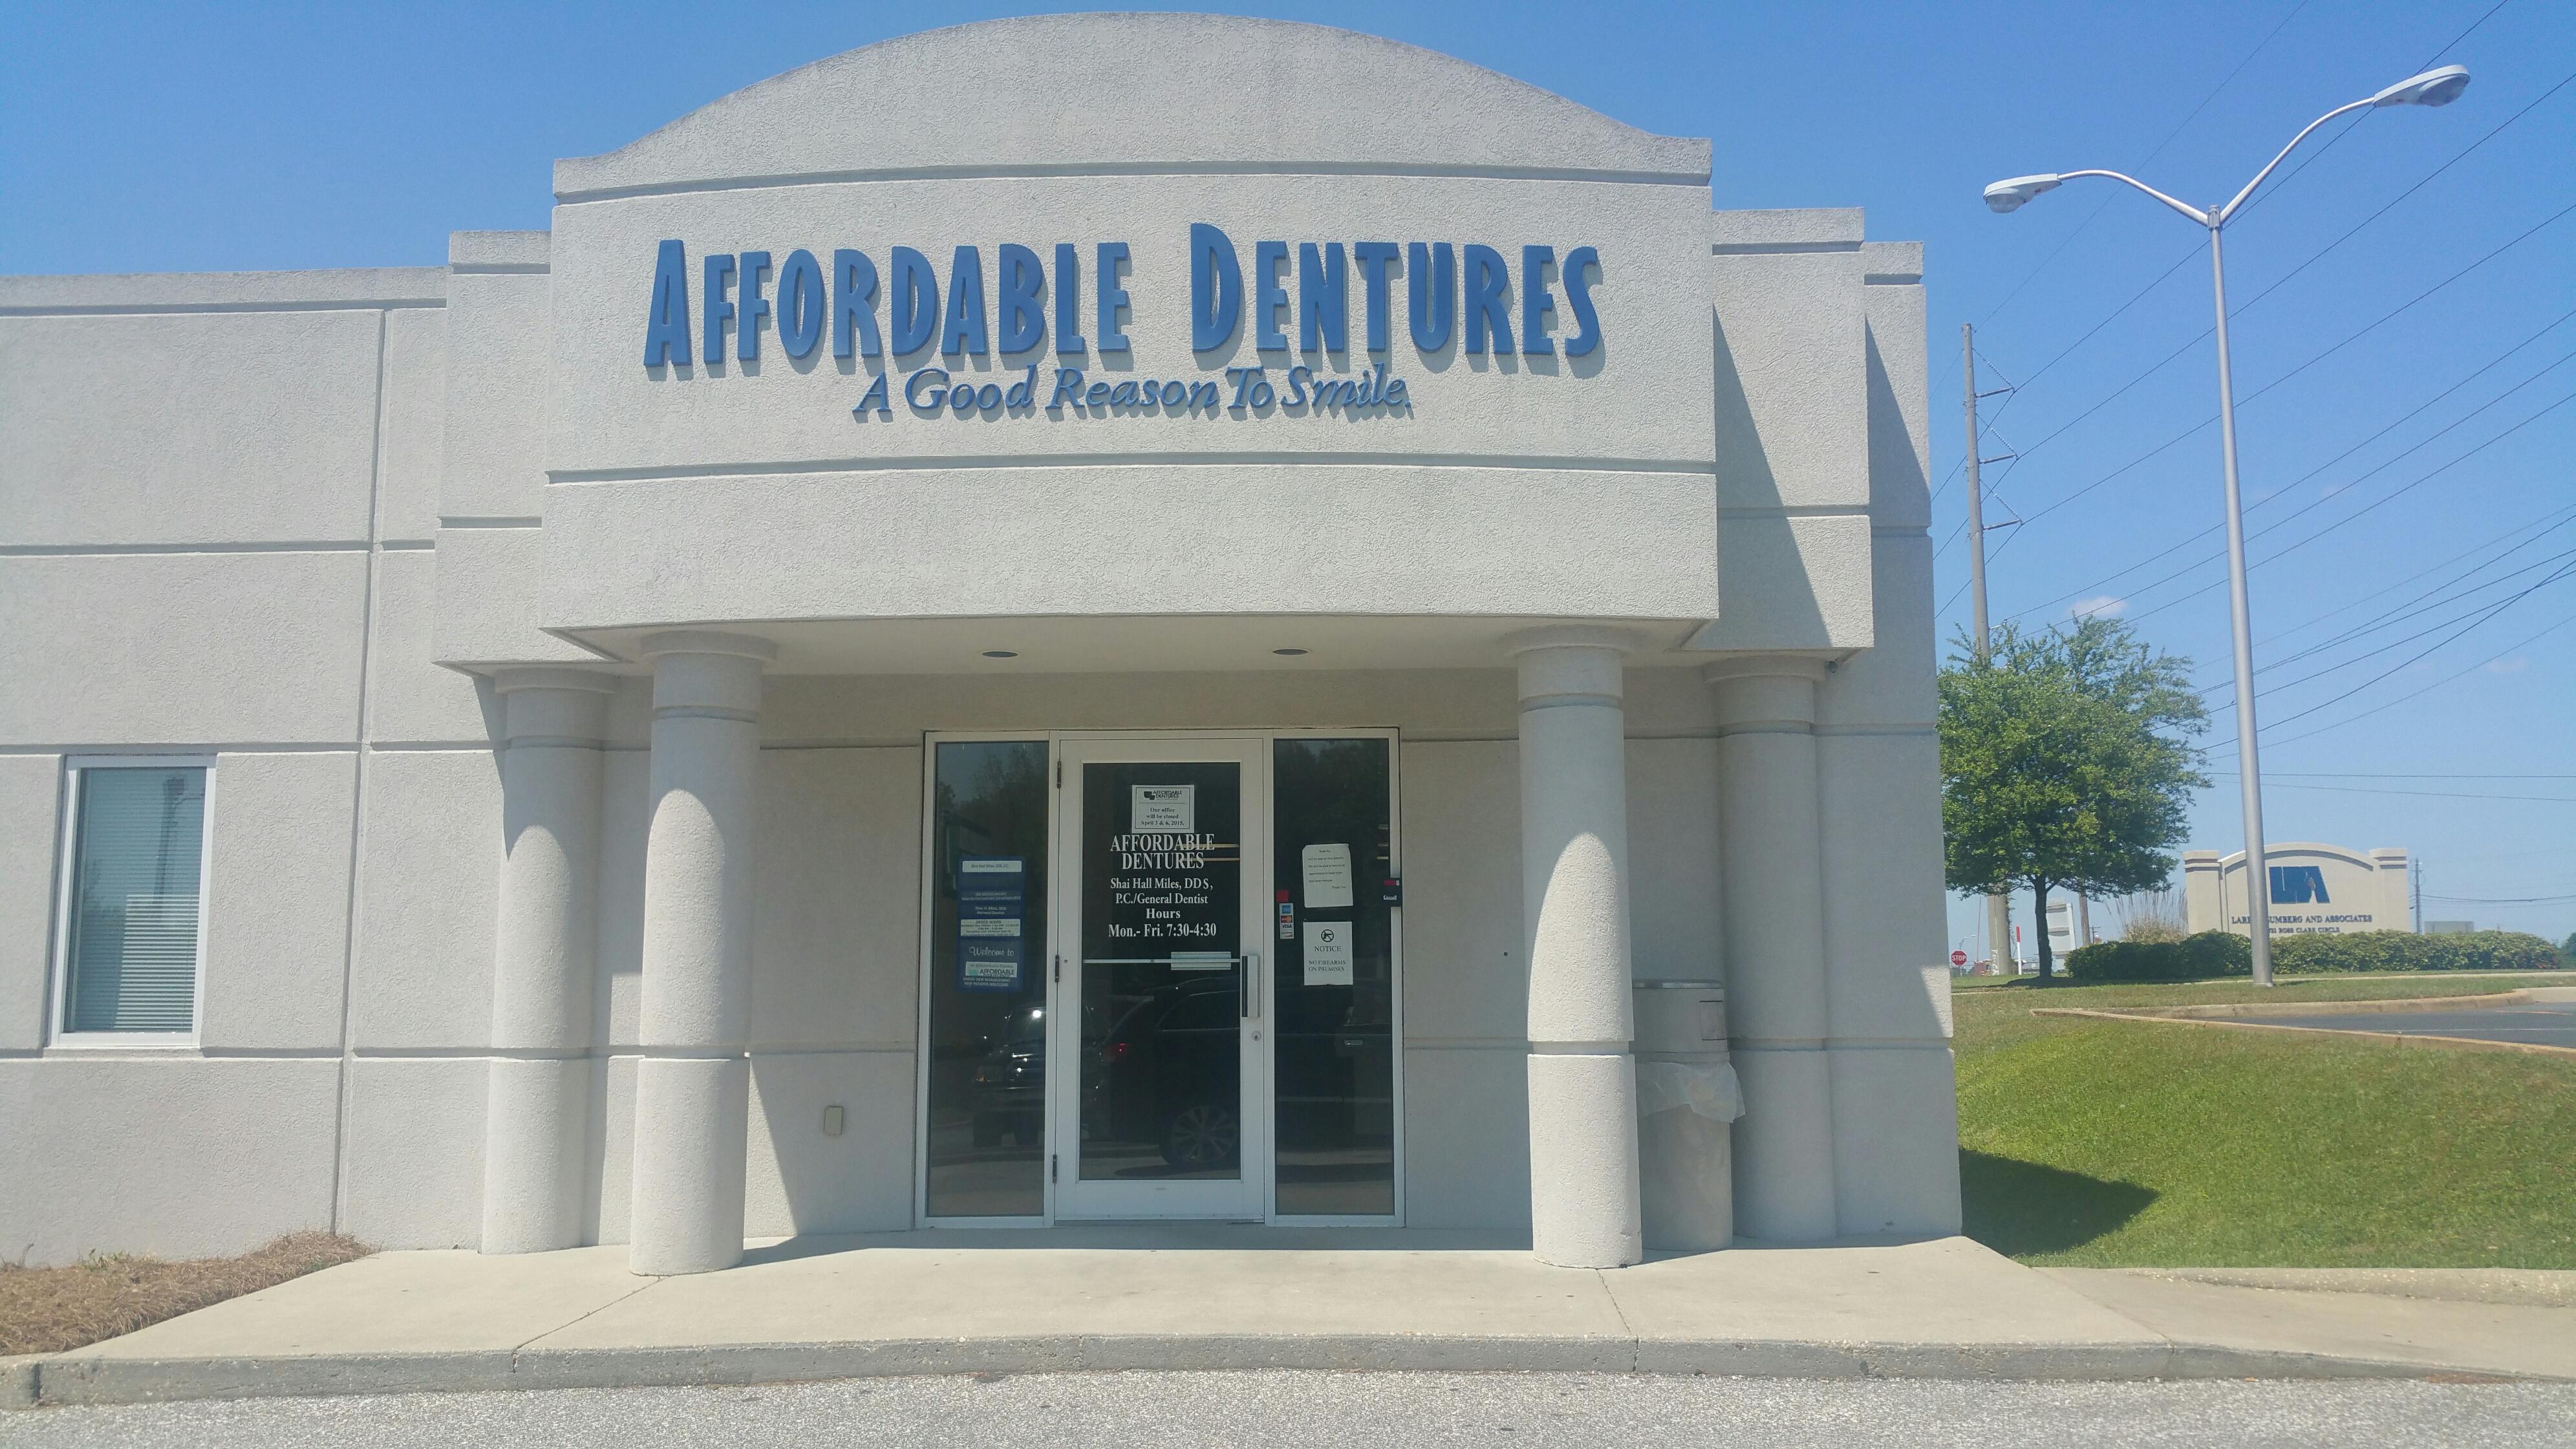 Affordable Dentures - Dothan, AL 36301 - (334) 702-0667 | ShowMeLocal.com